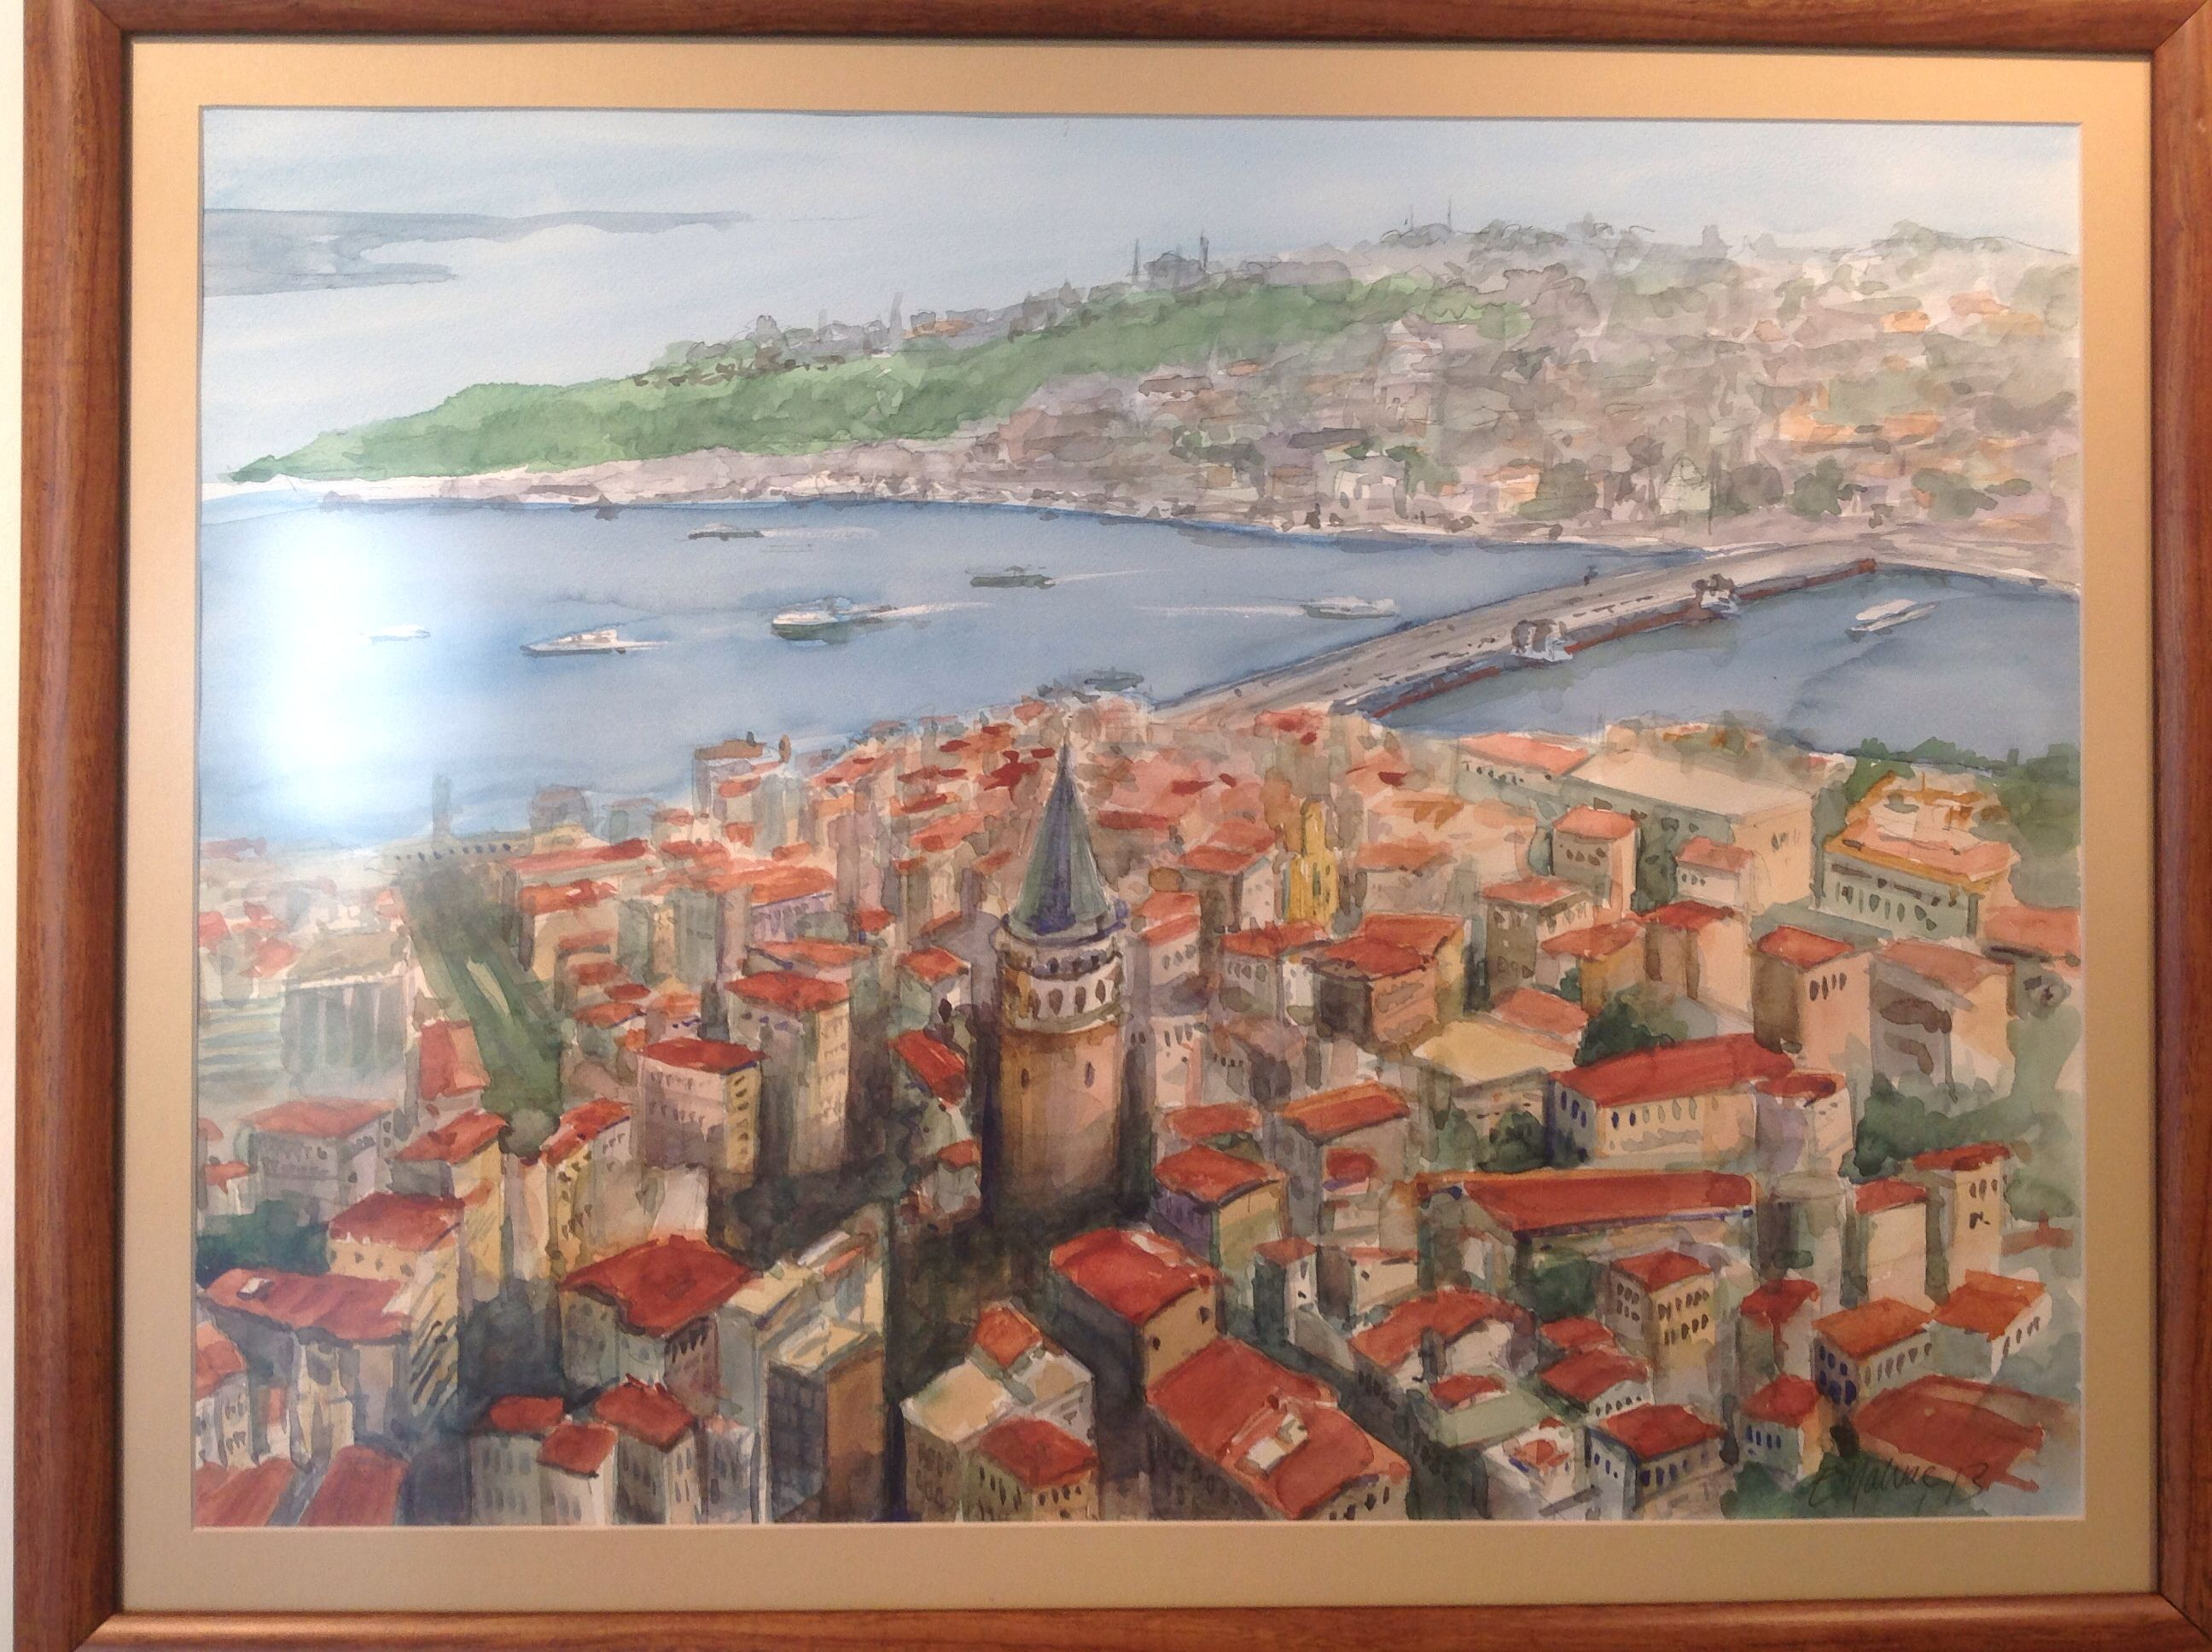 By Erhan Yalvaç #watercolor #painting